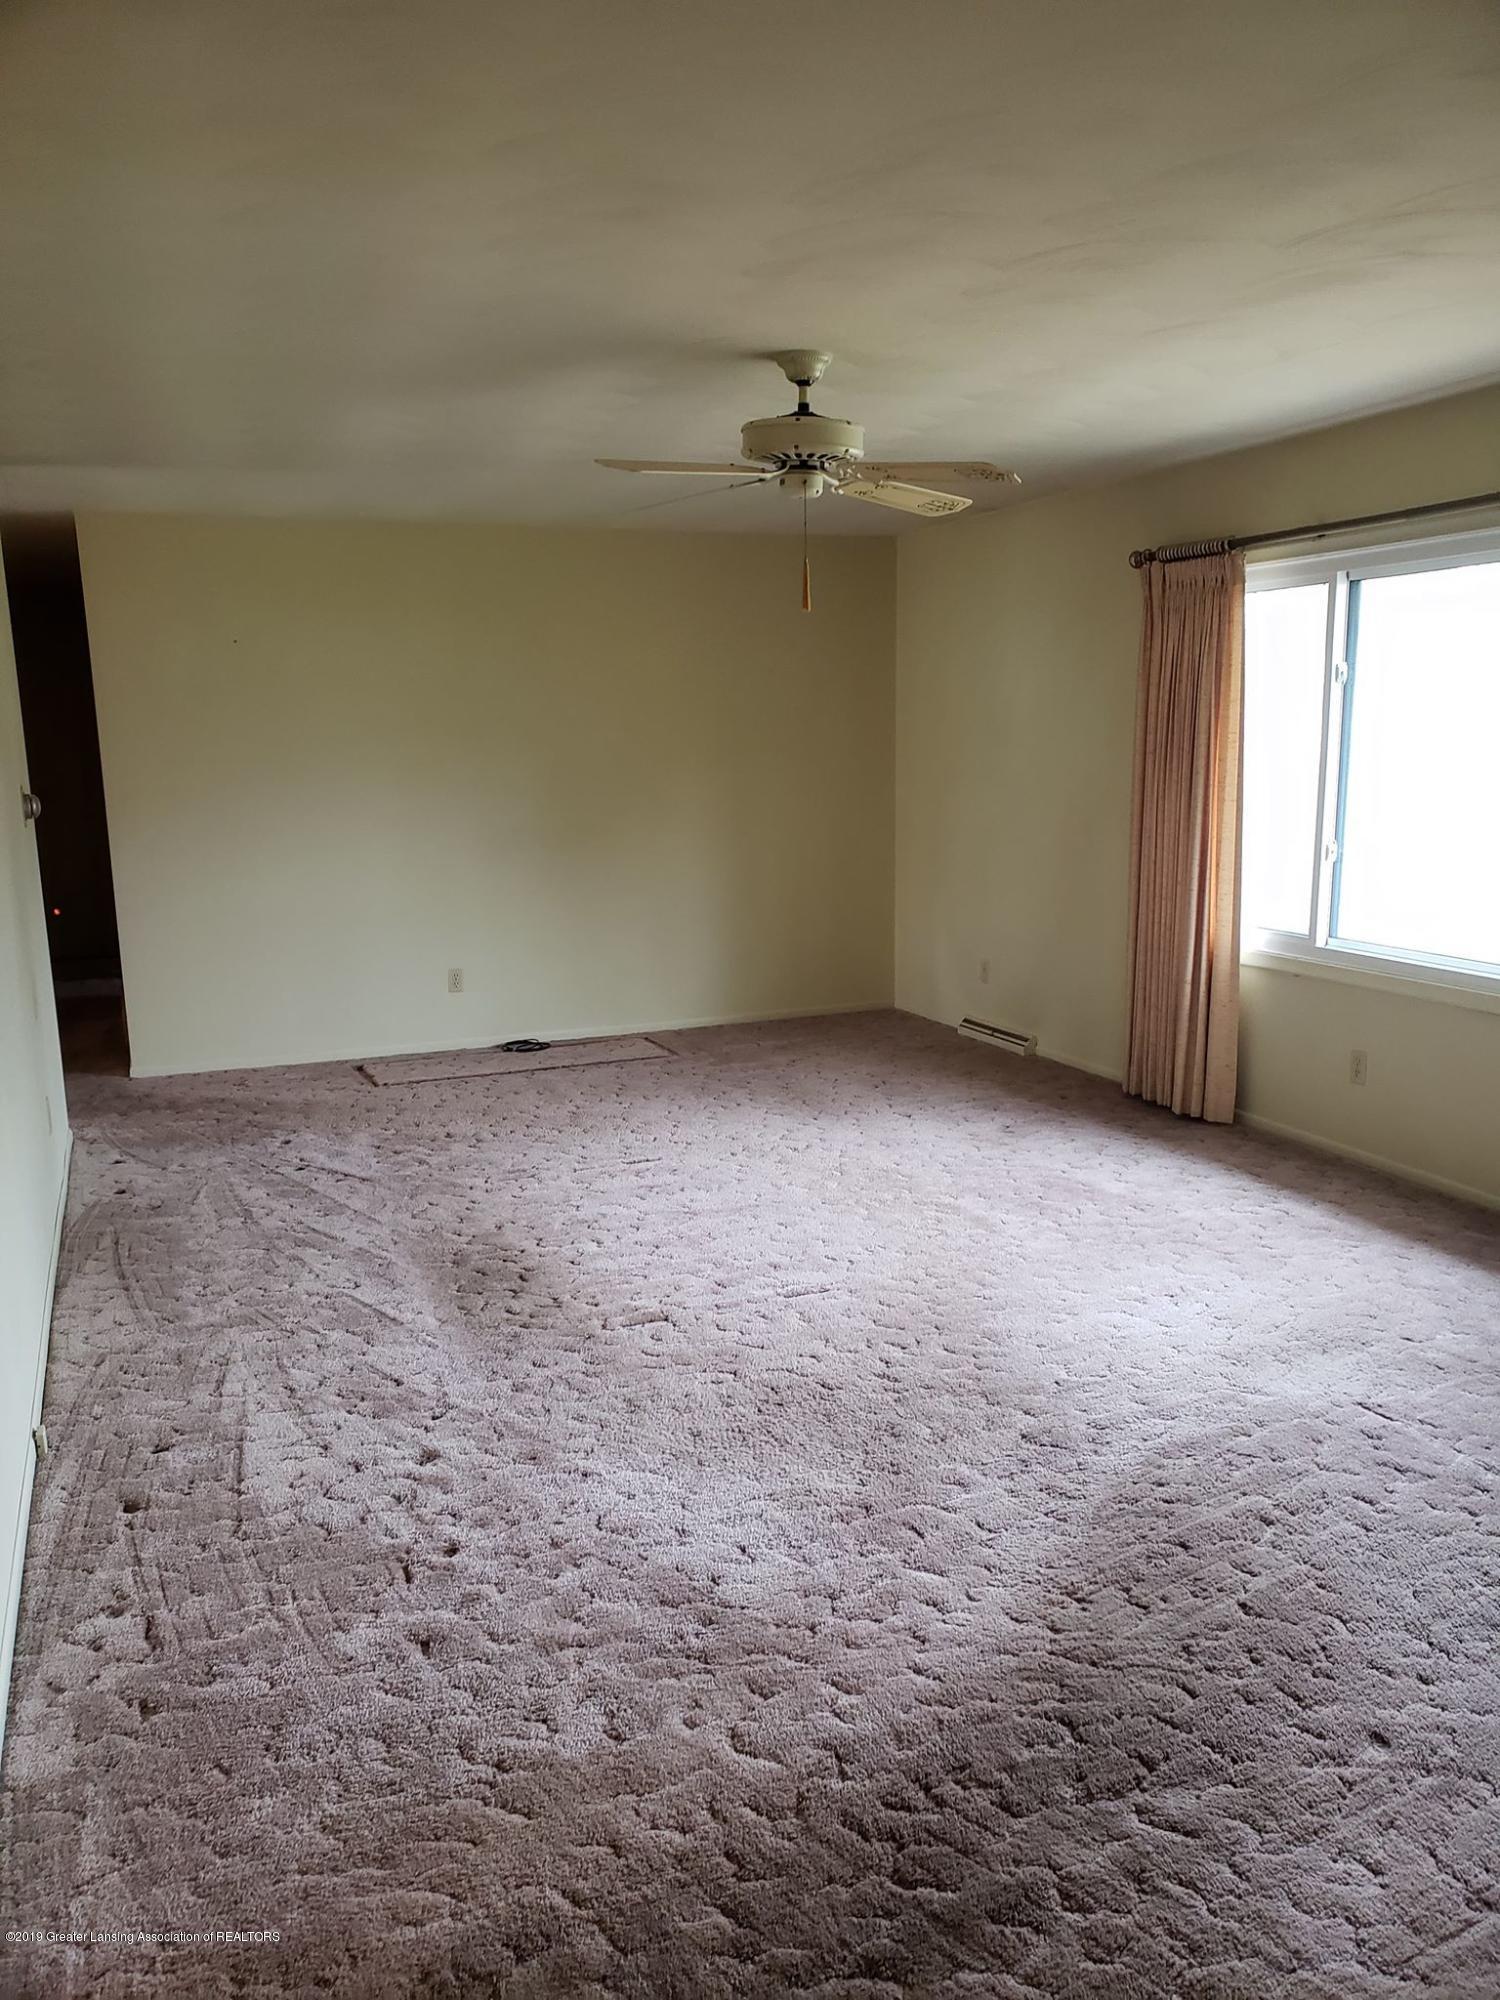 1304 Montgomery St - Living room area - 15